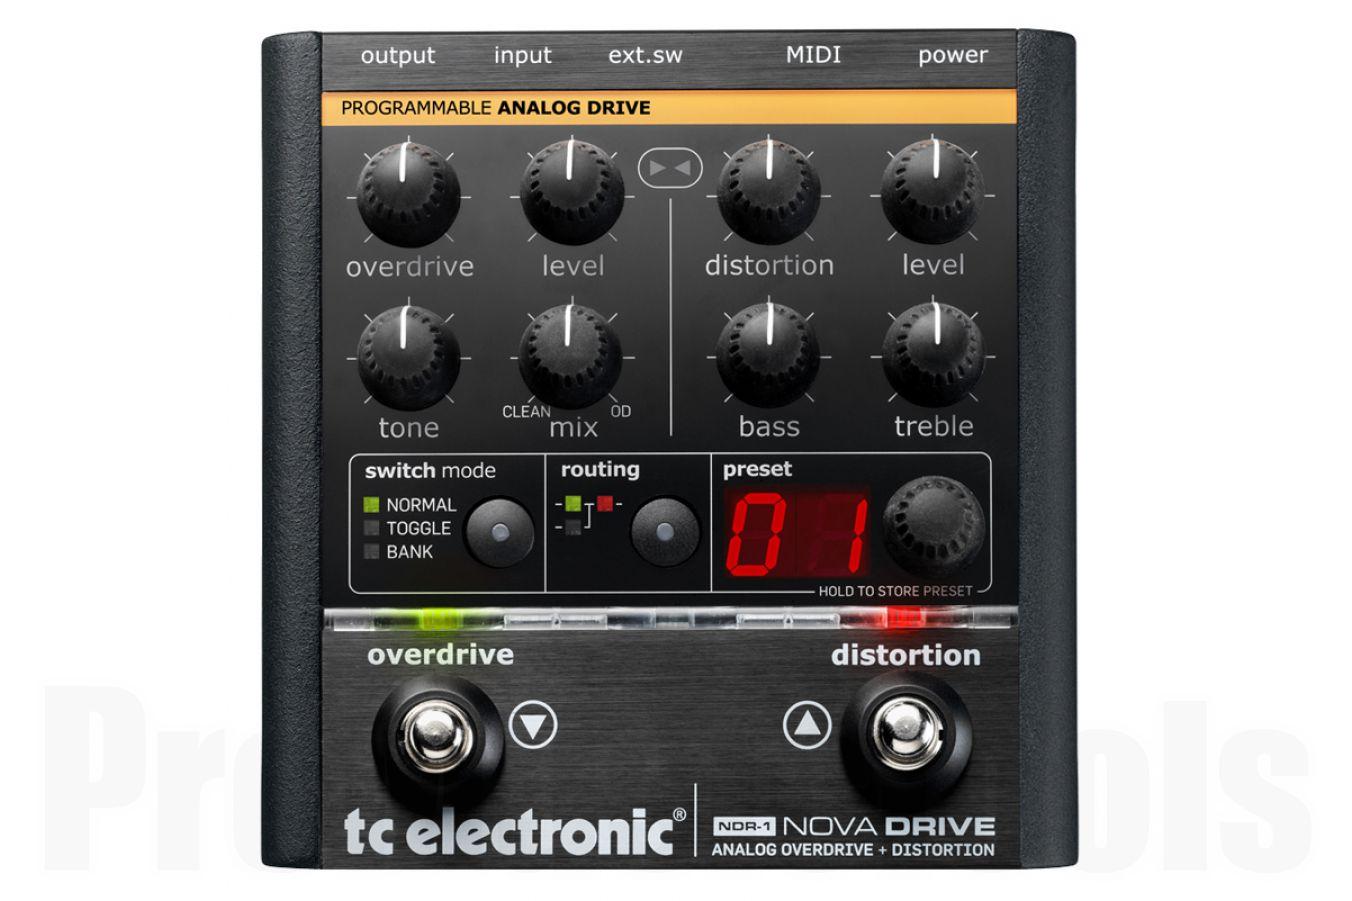 TC Electronic NDR-1 Nova Drive - b-stock (1x opened box)